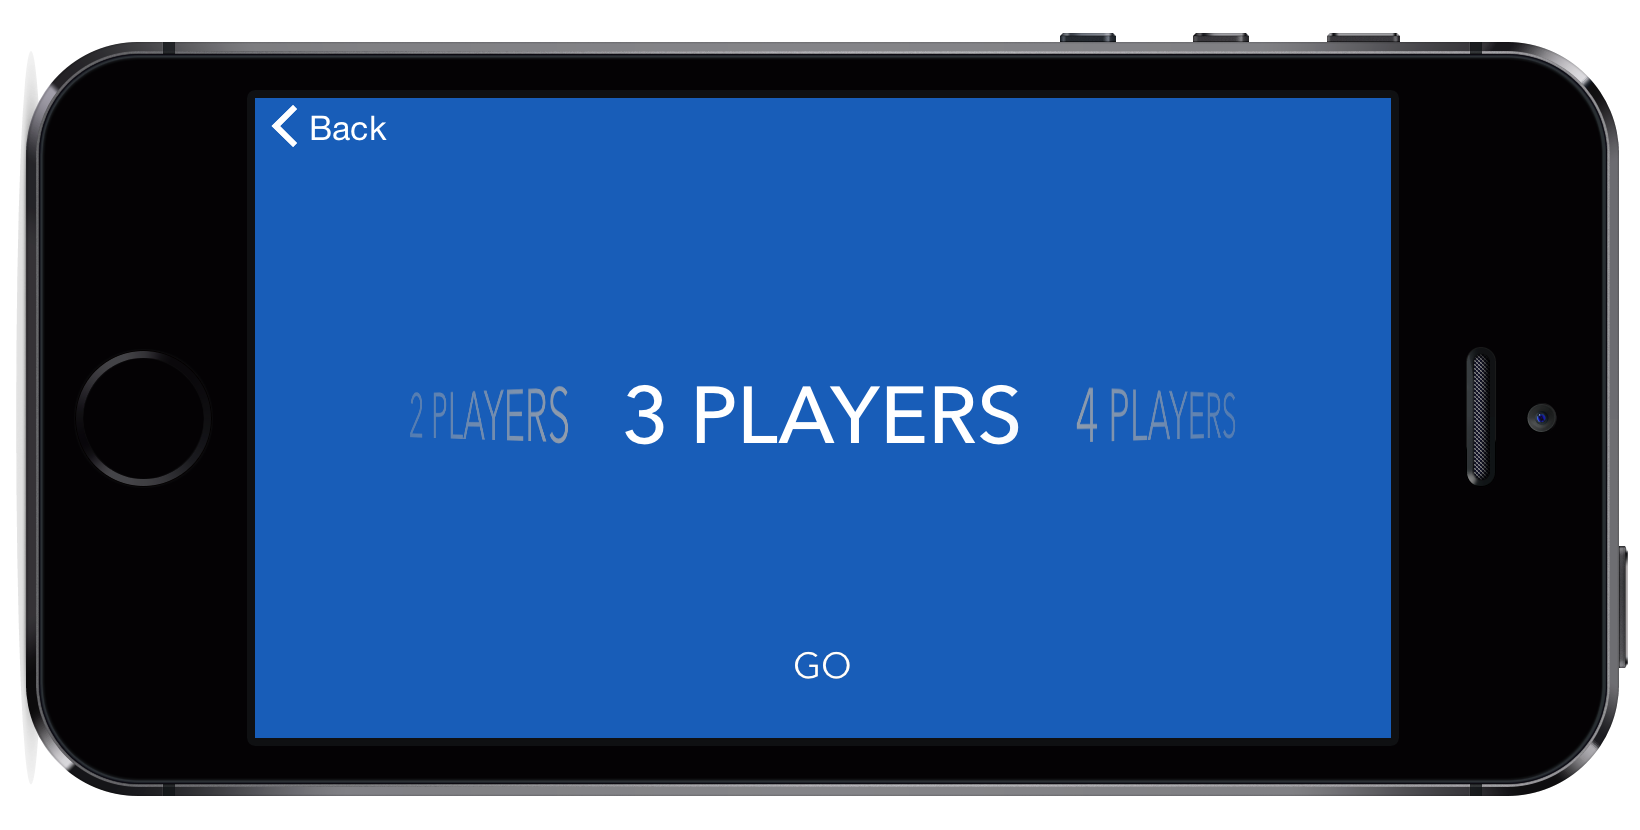 Player #